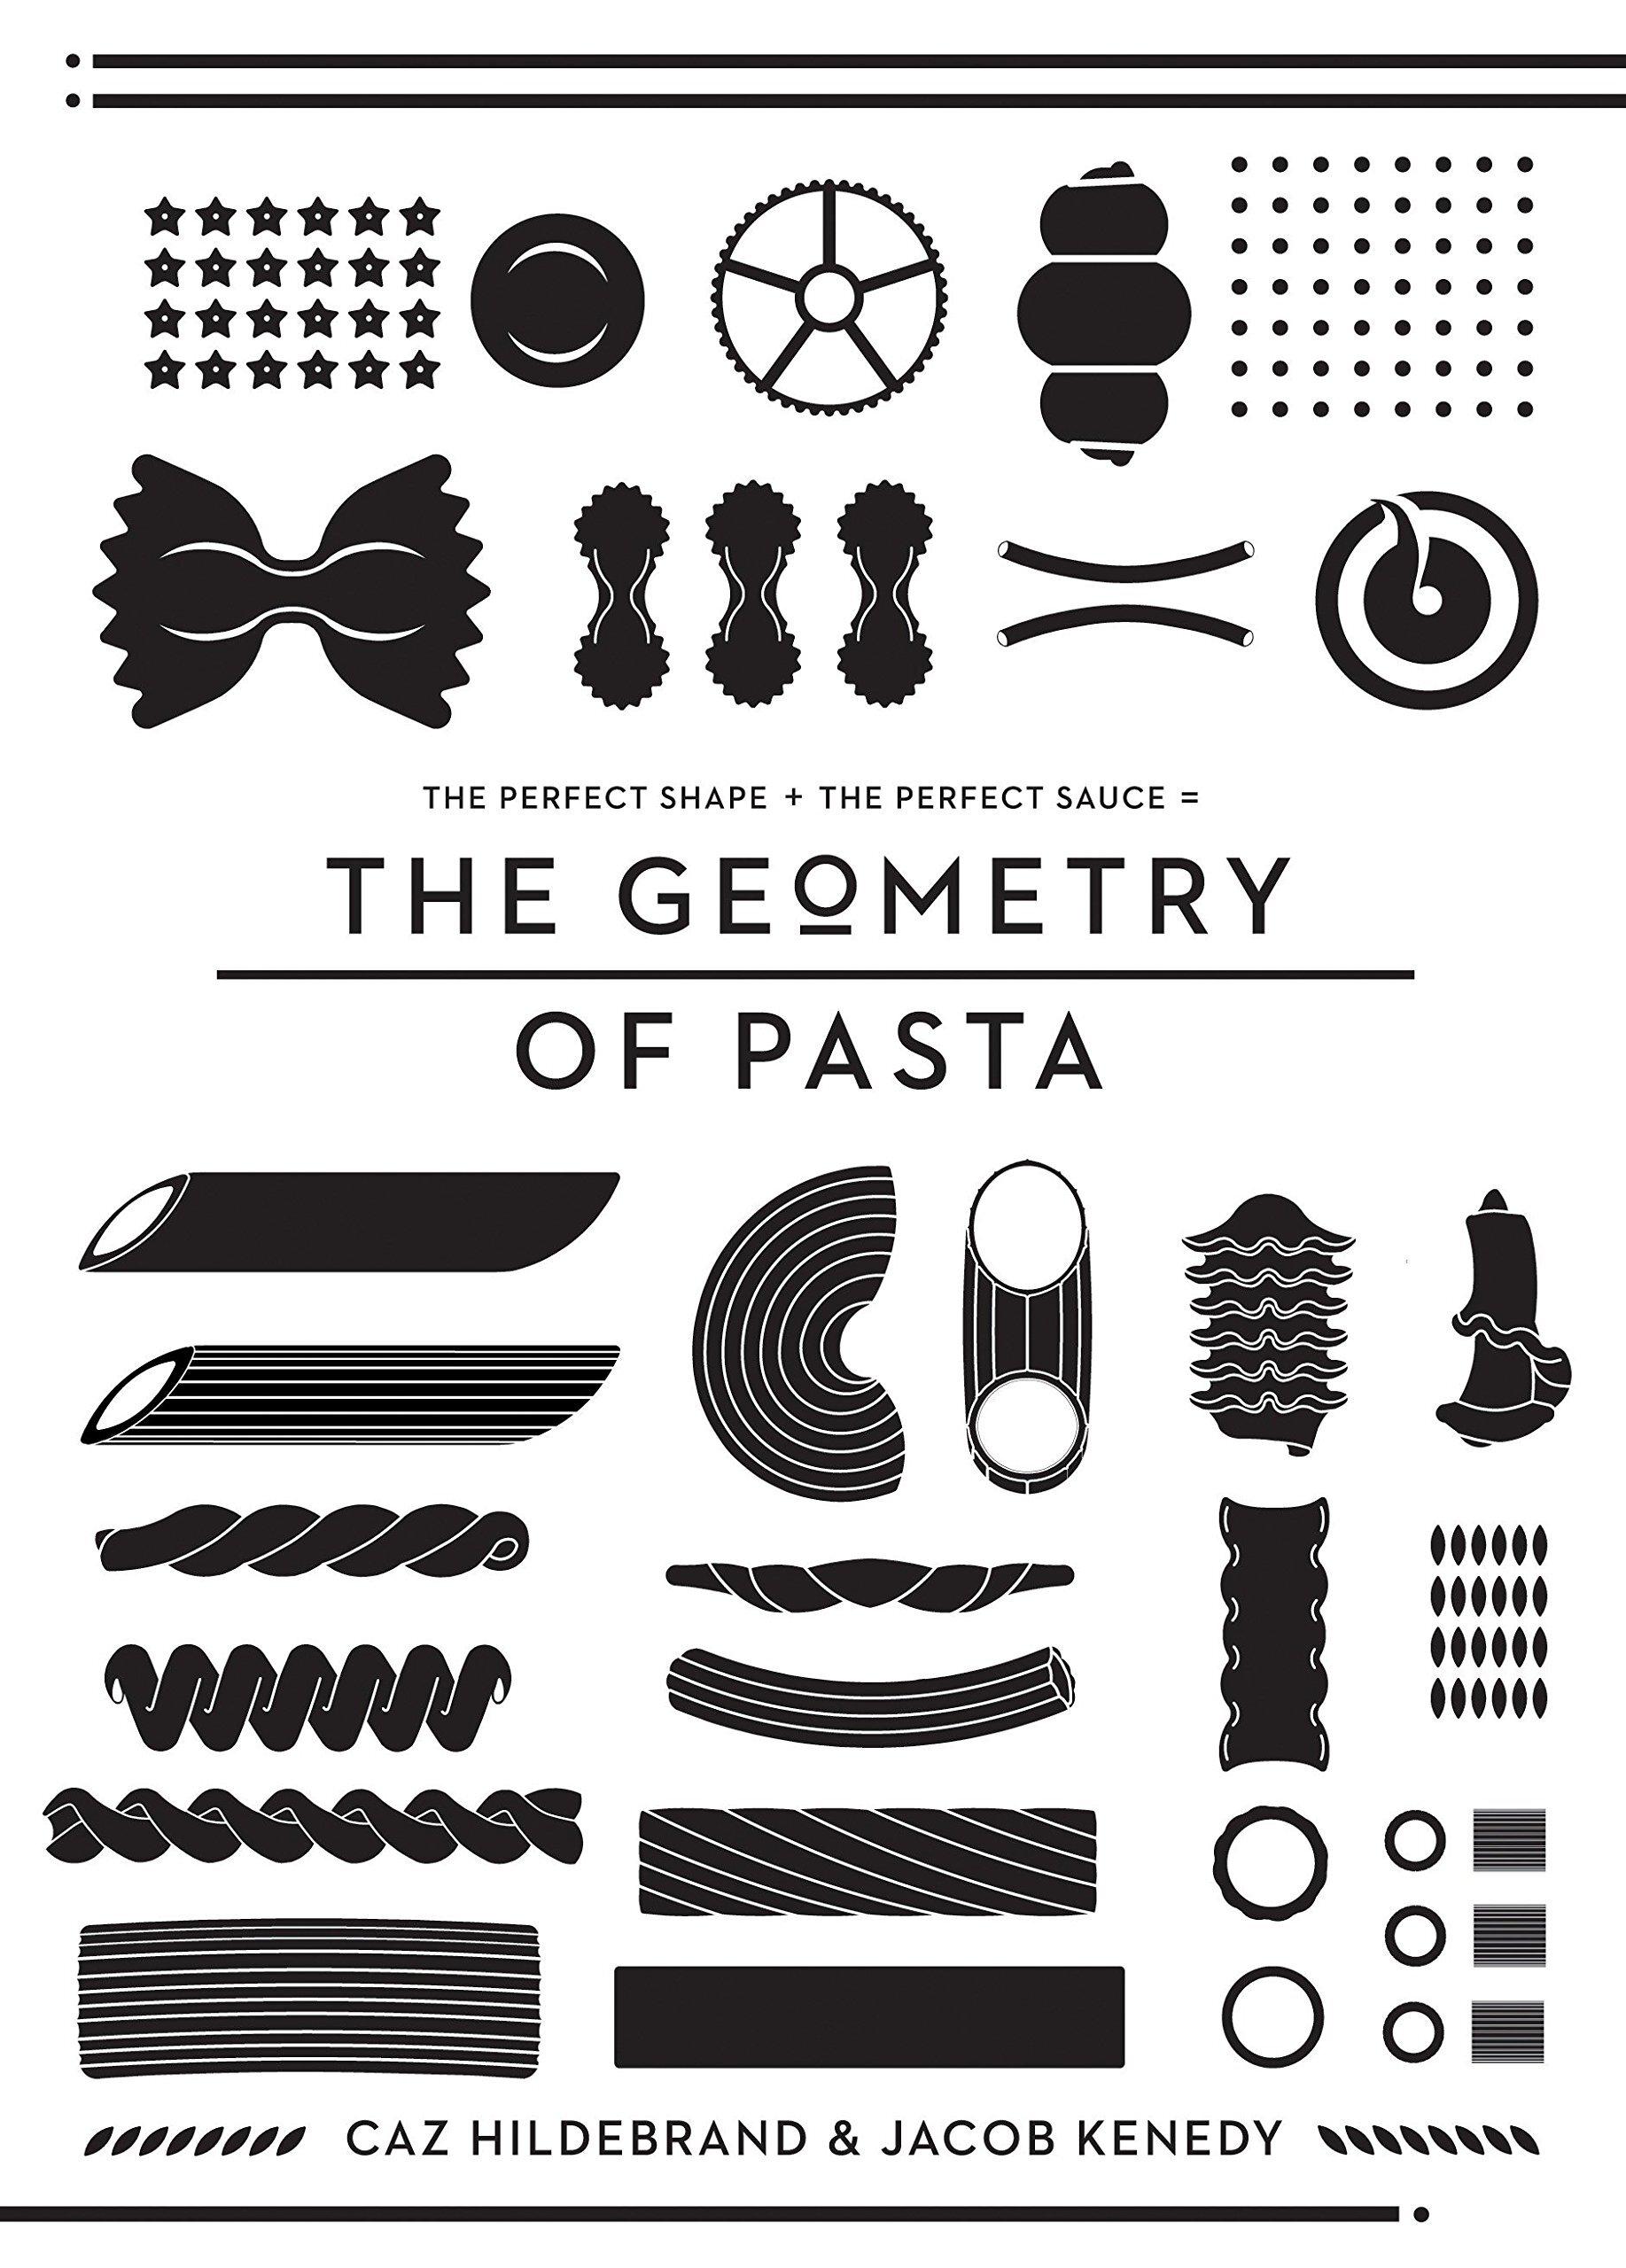 TheGeometryofPasta copy.jpg